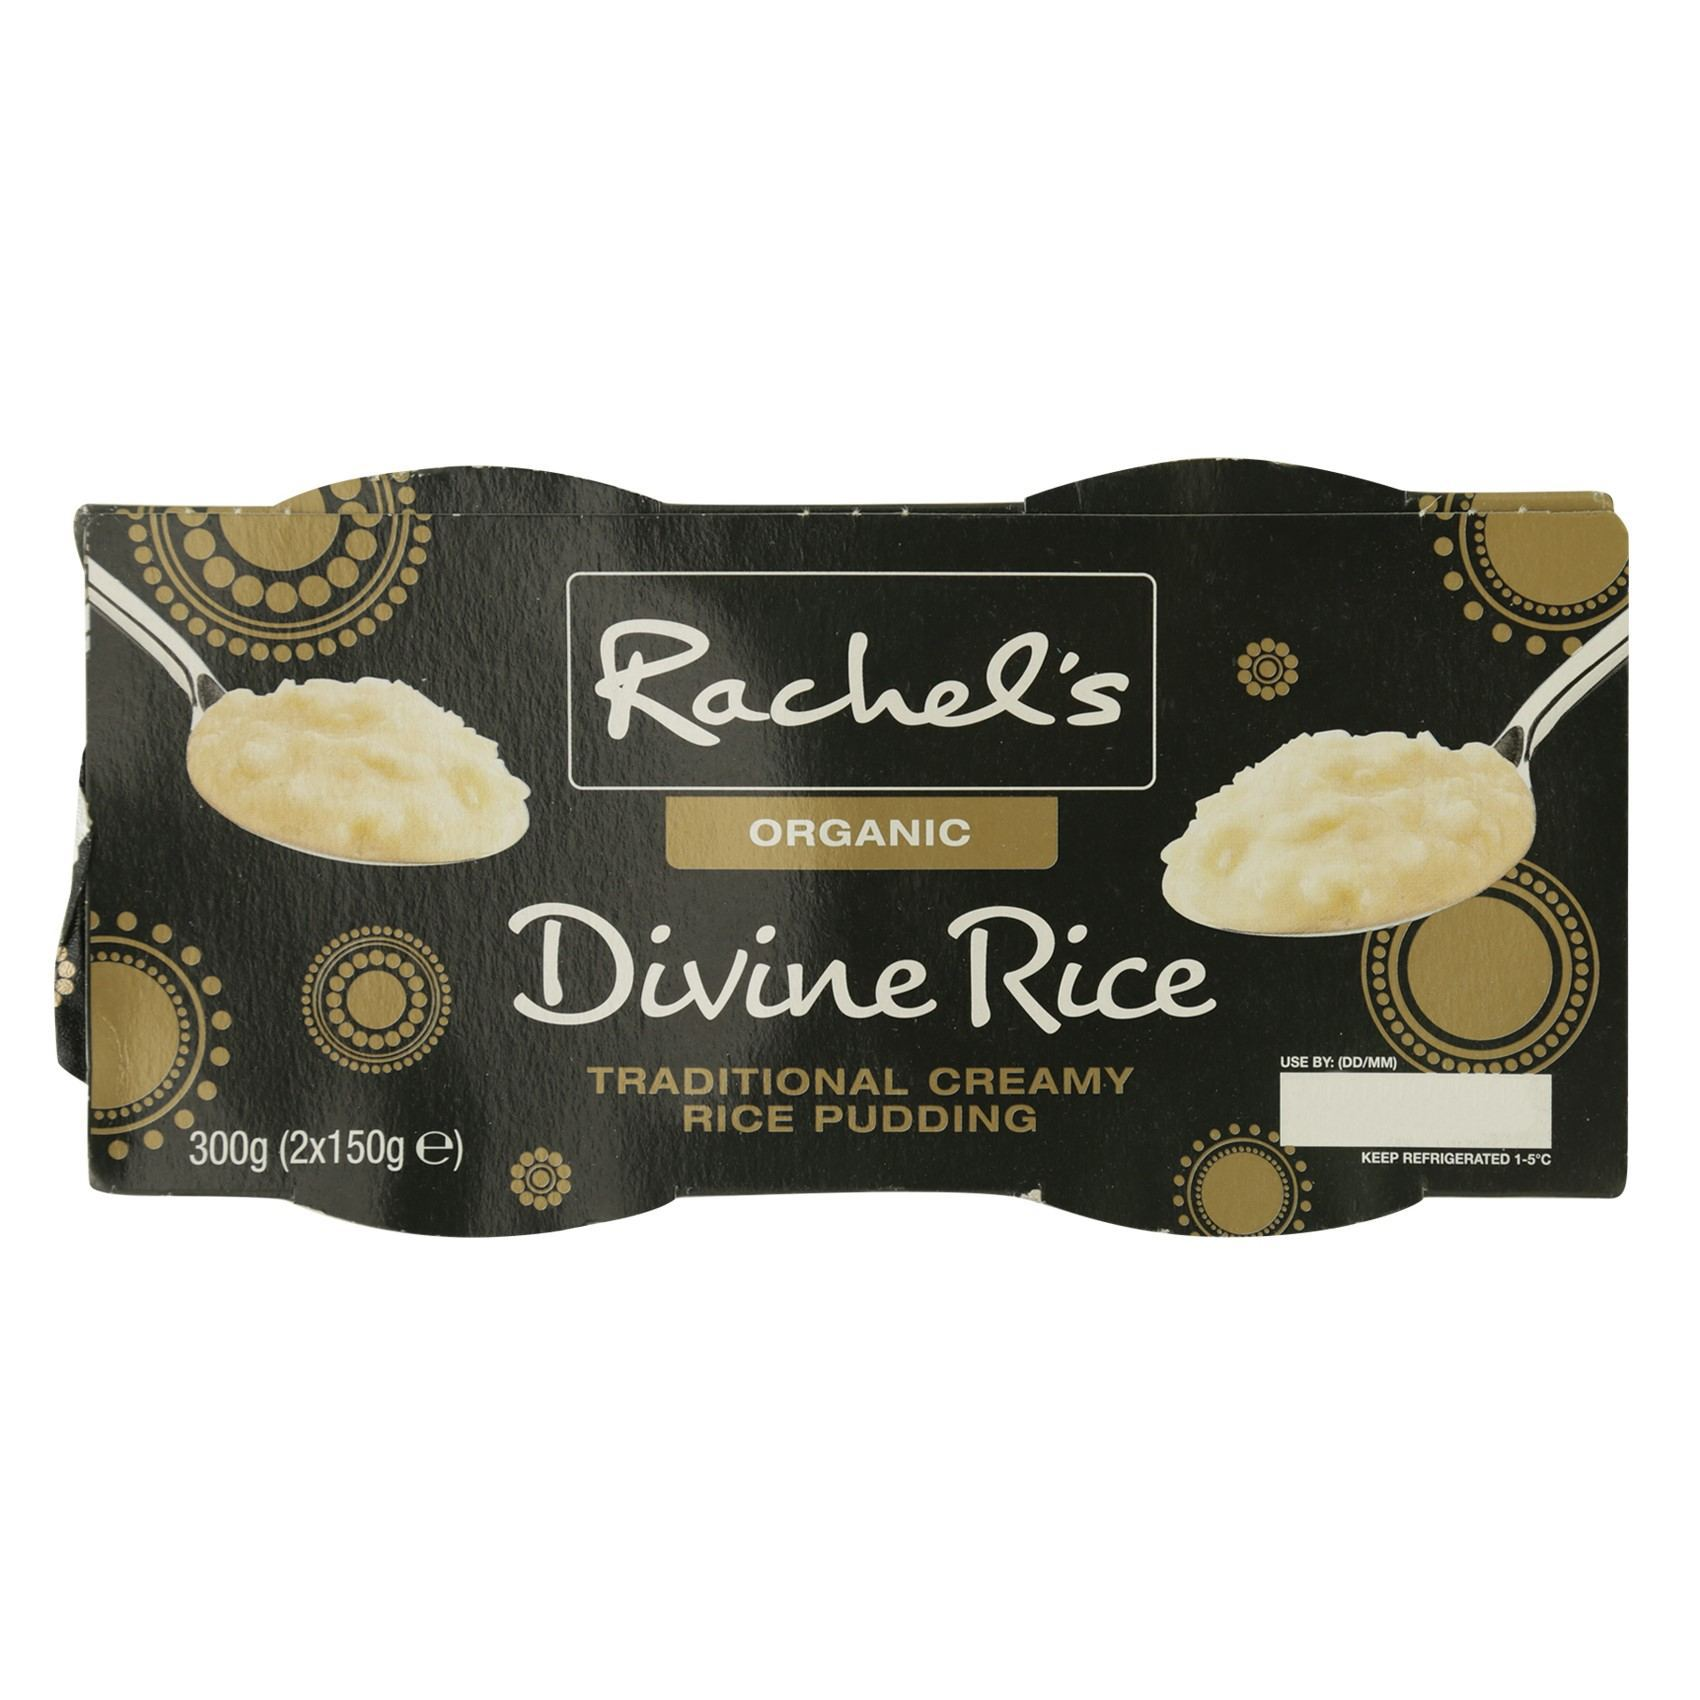 RACHEL'S O DIVINE RICE TRAD 150GX2